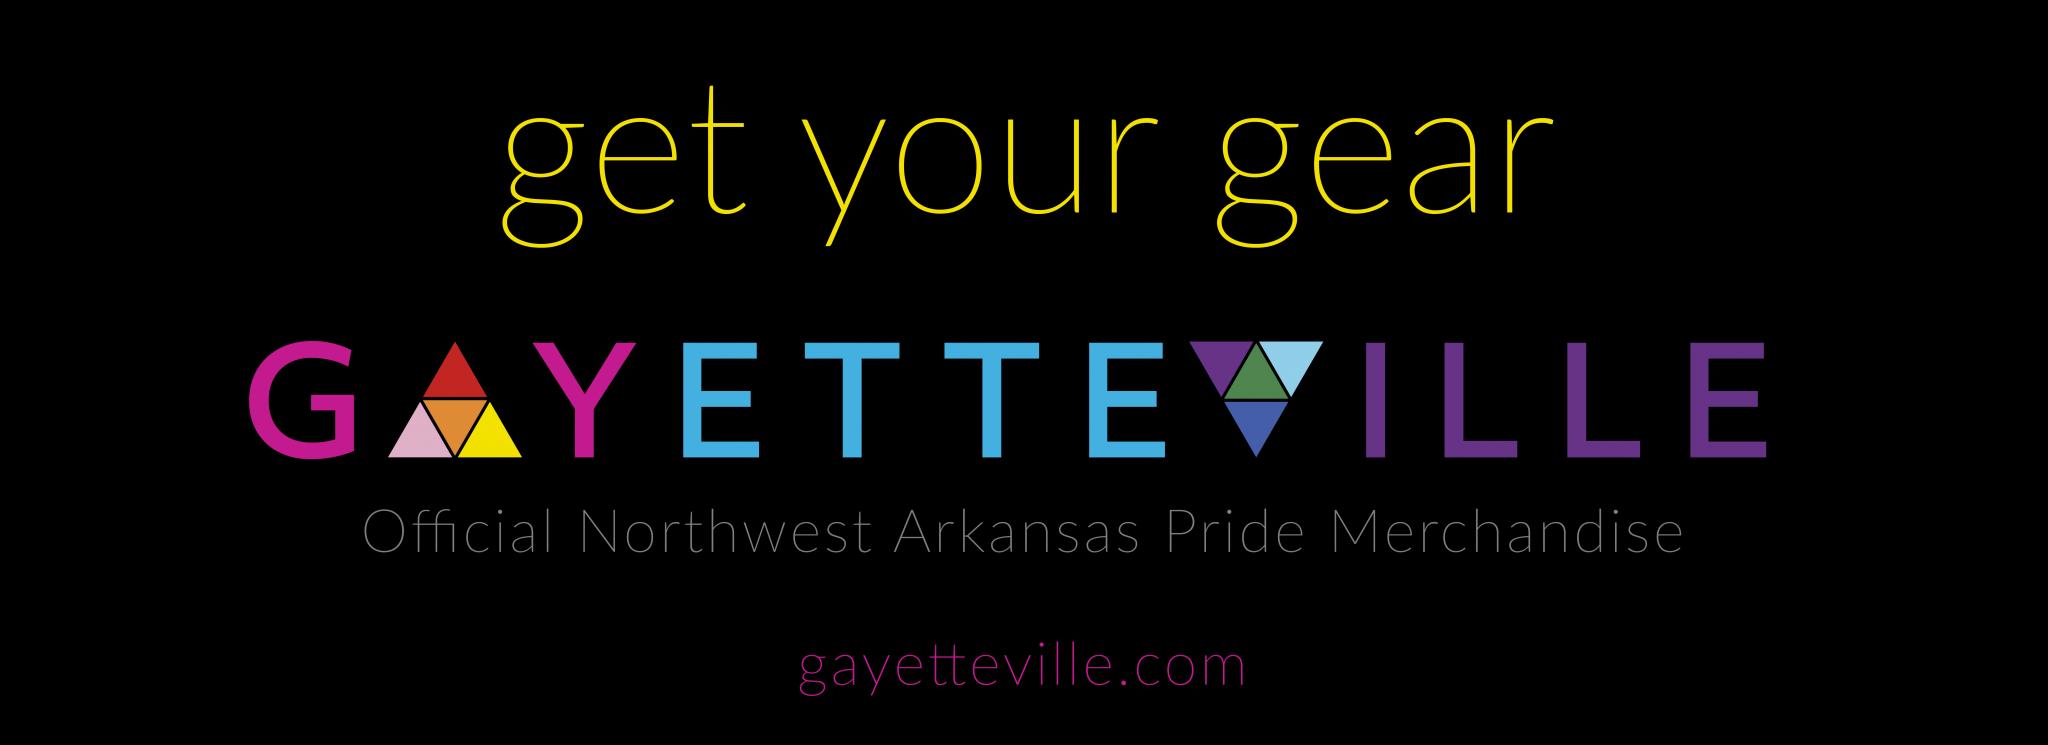 Gayetteville-01